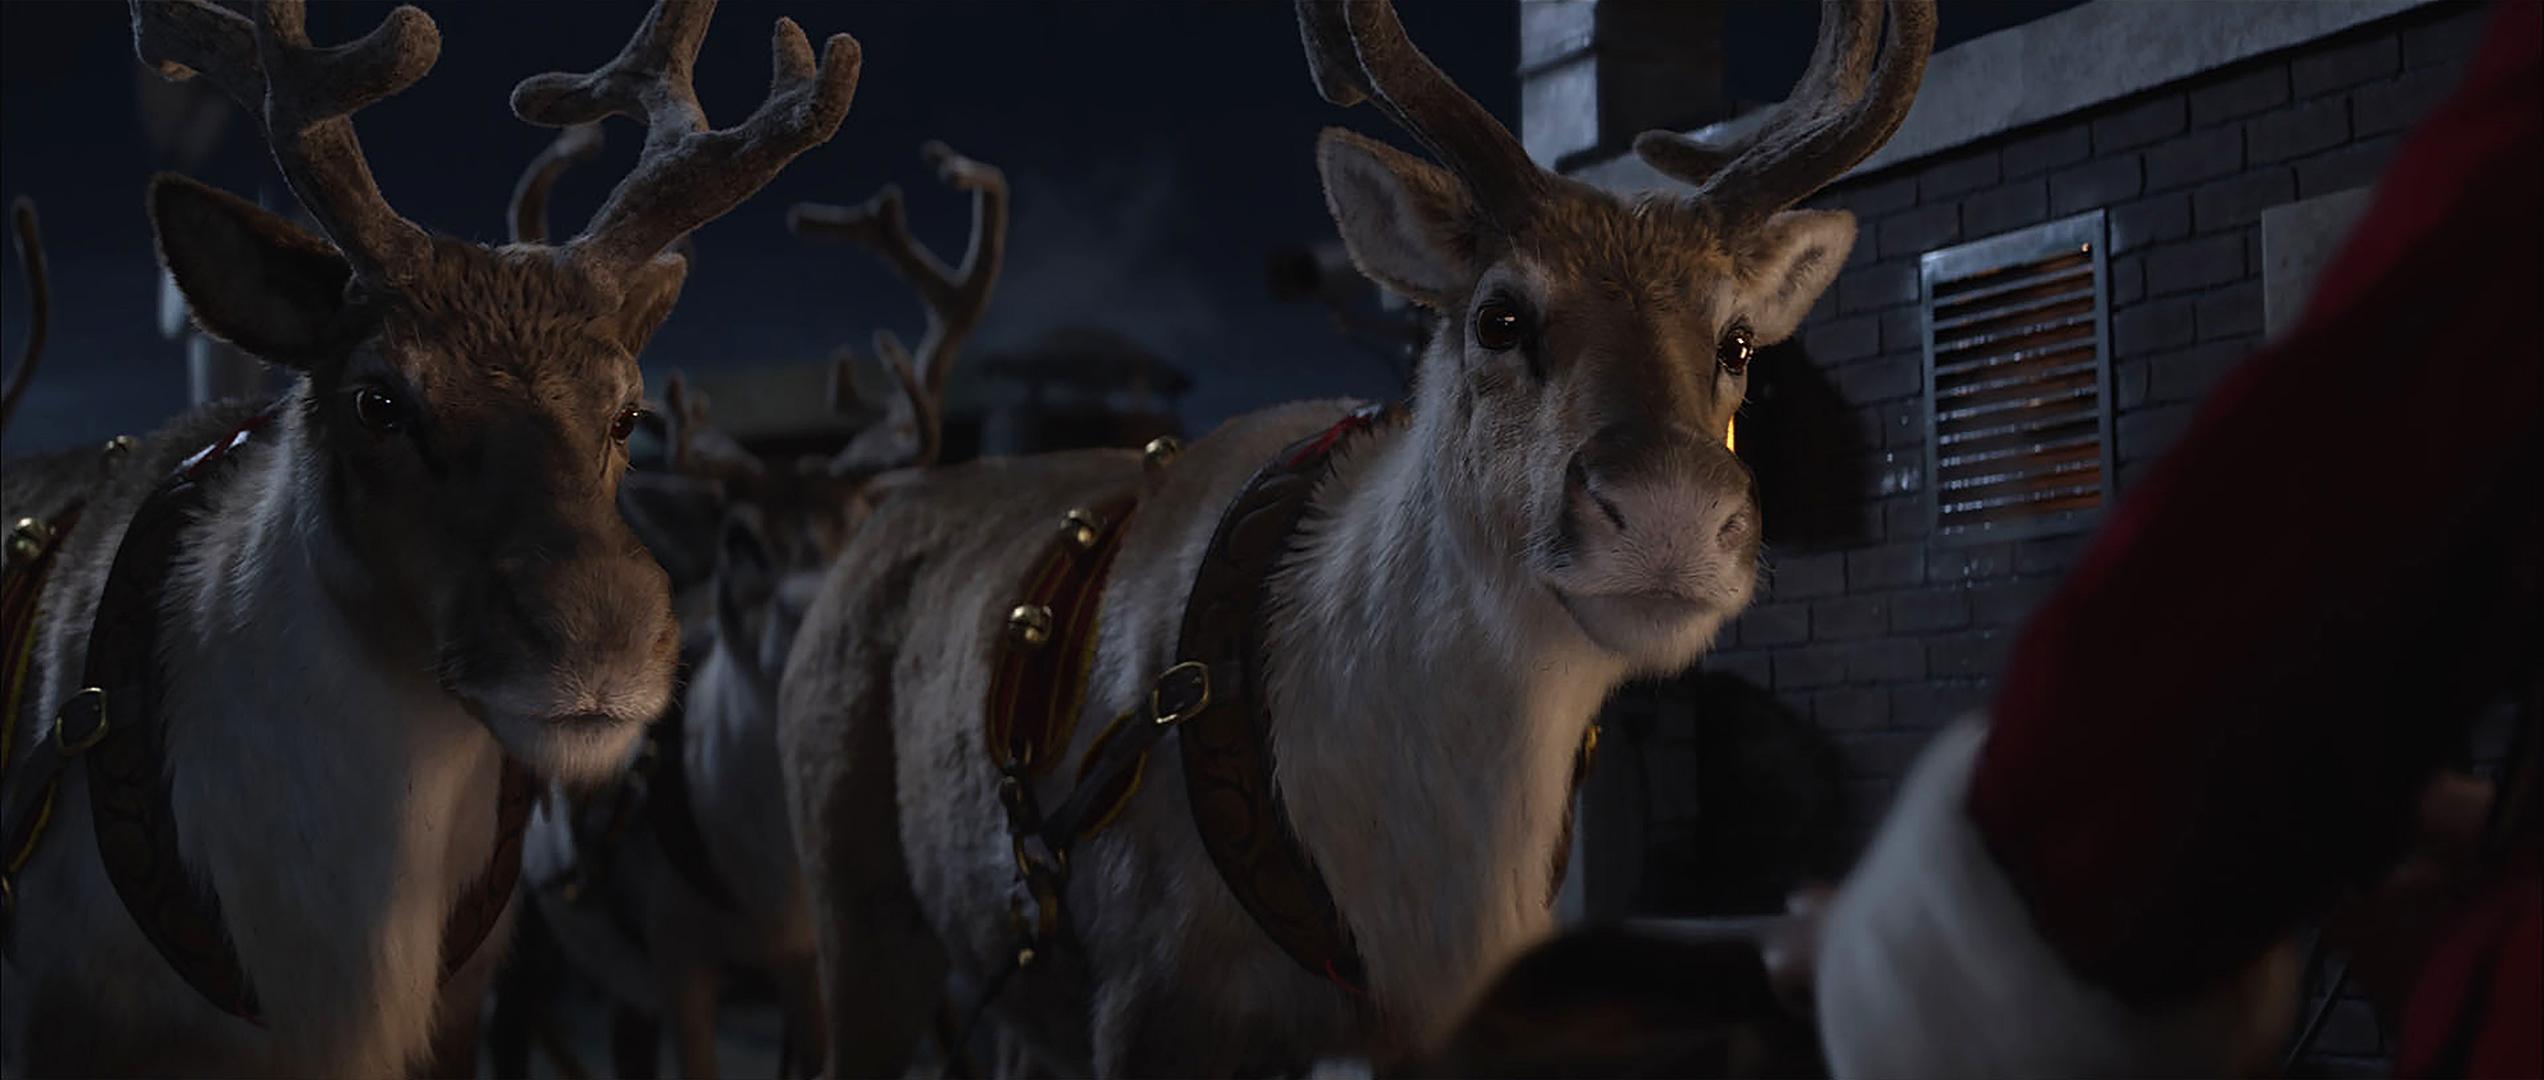 #ReindeerReady